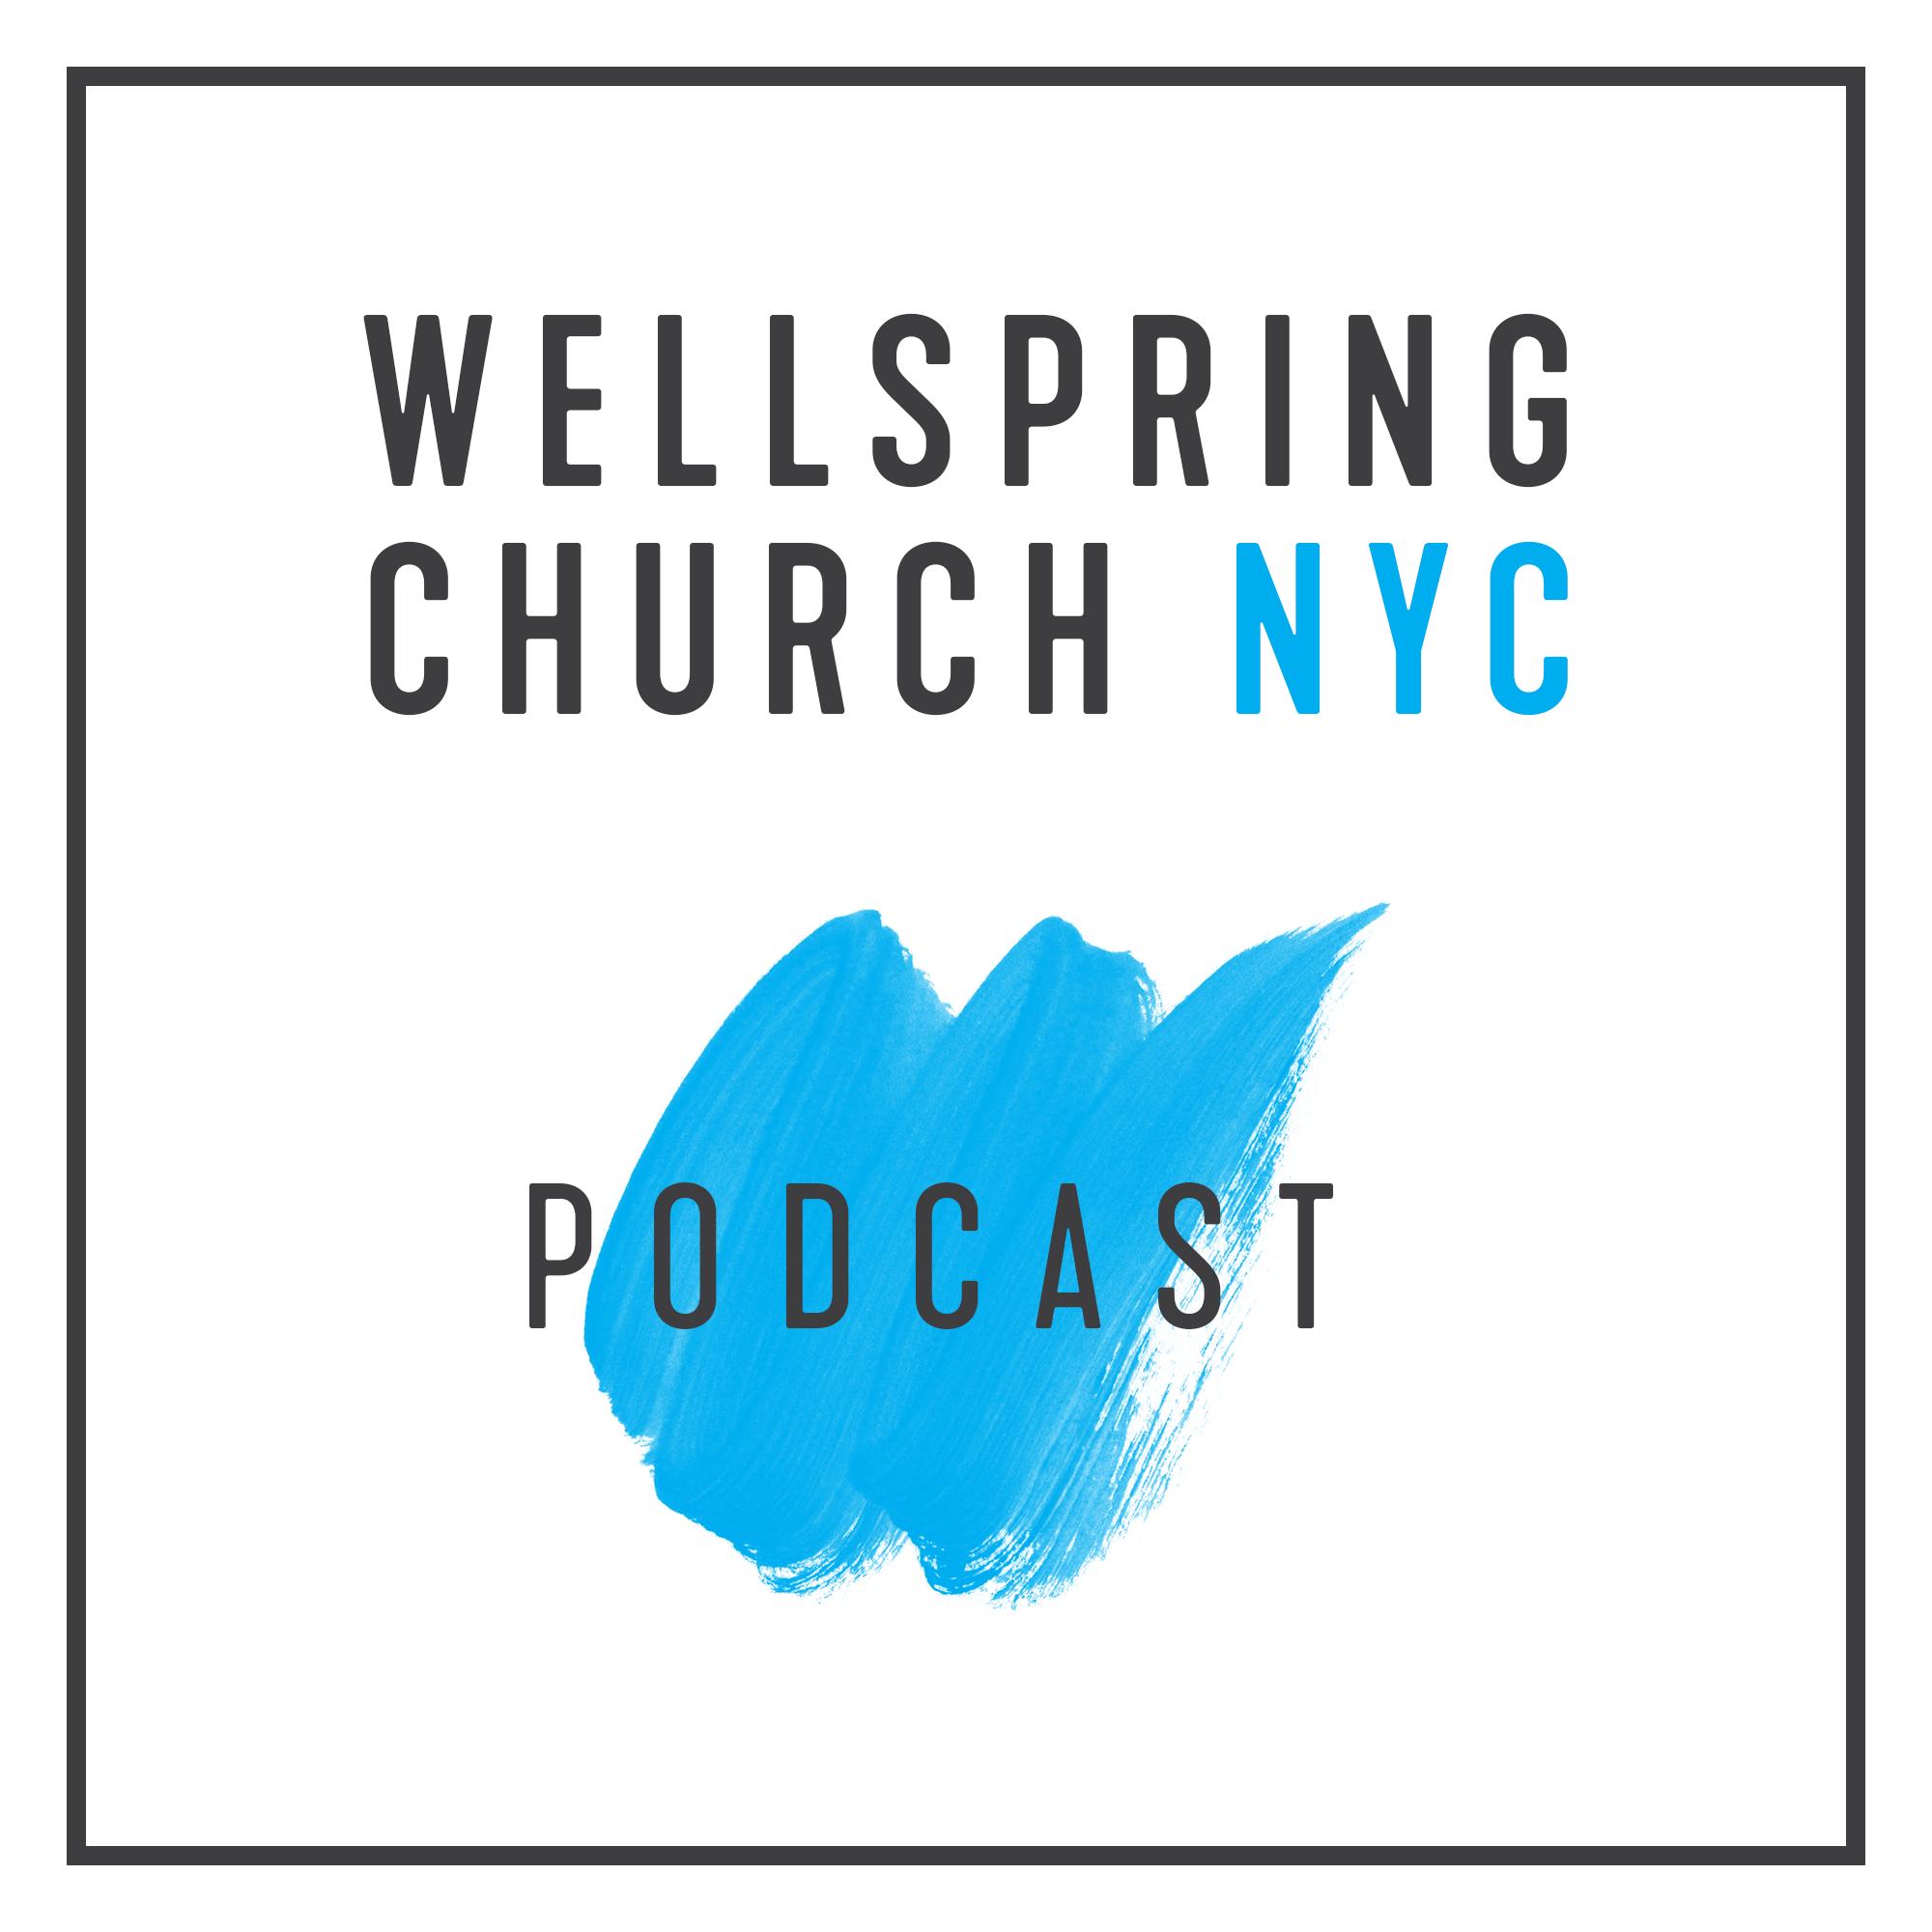 Wellspring Church NYC - PODCAST show art